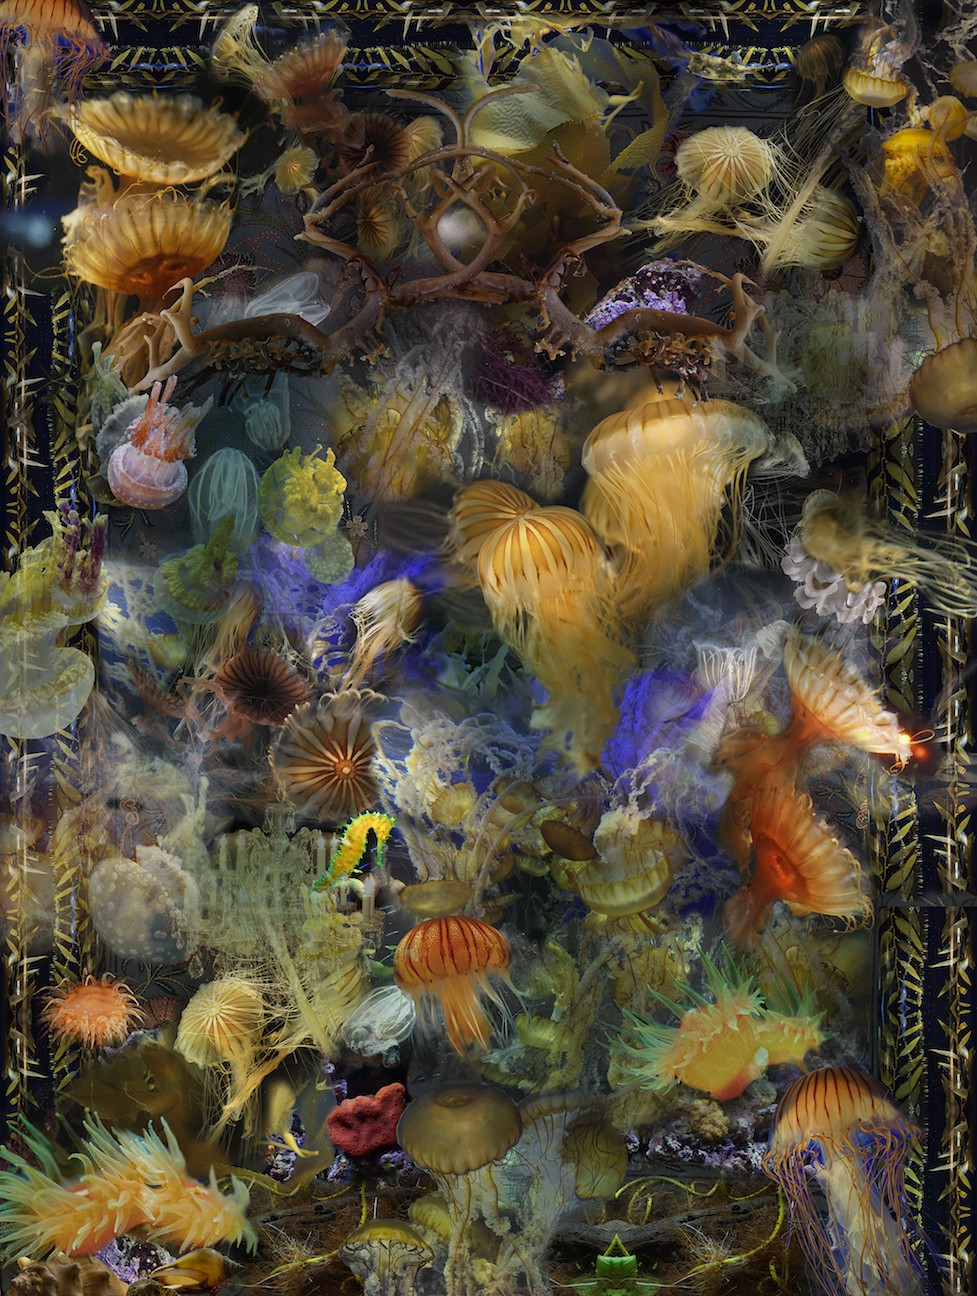 frank_orange_jellyfishthrough_seas_to_seek_48_x_36_digital_photograph.jpg